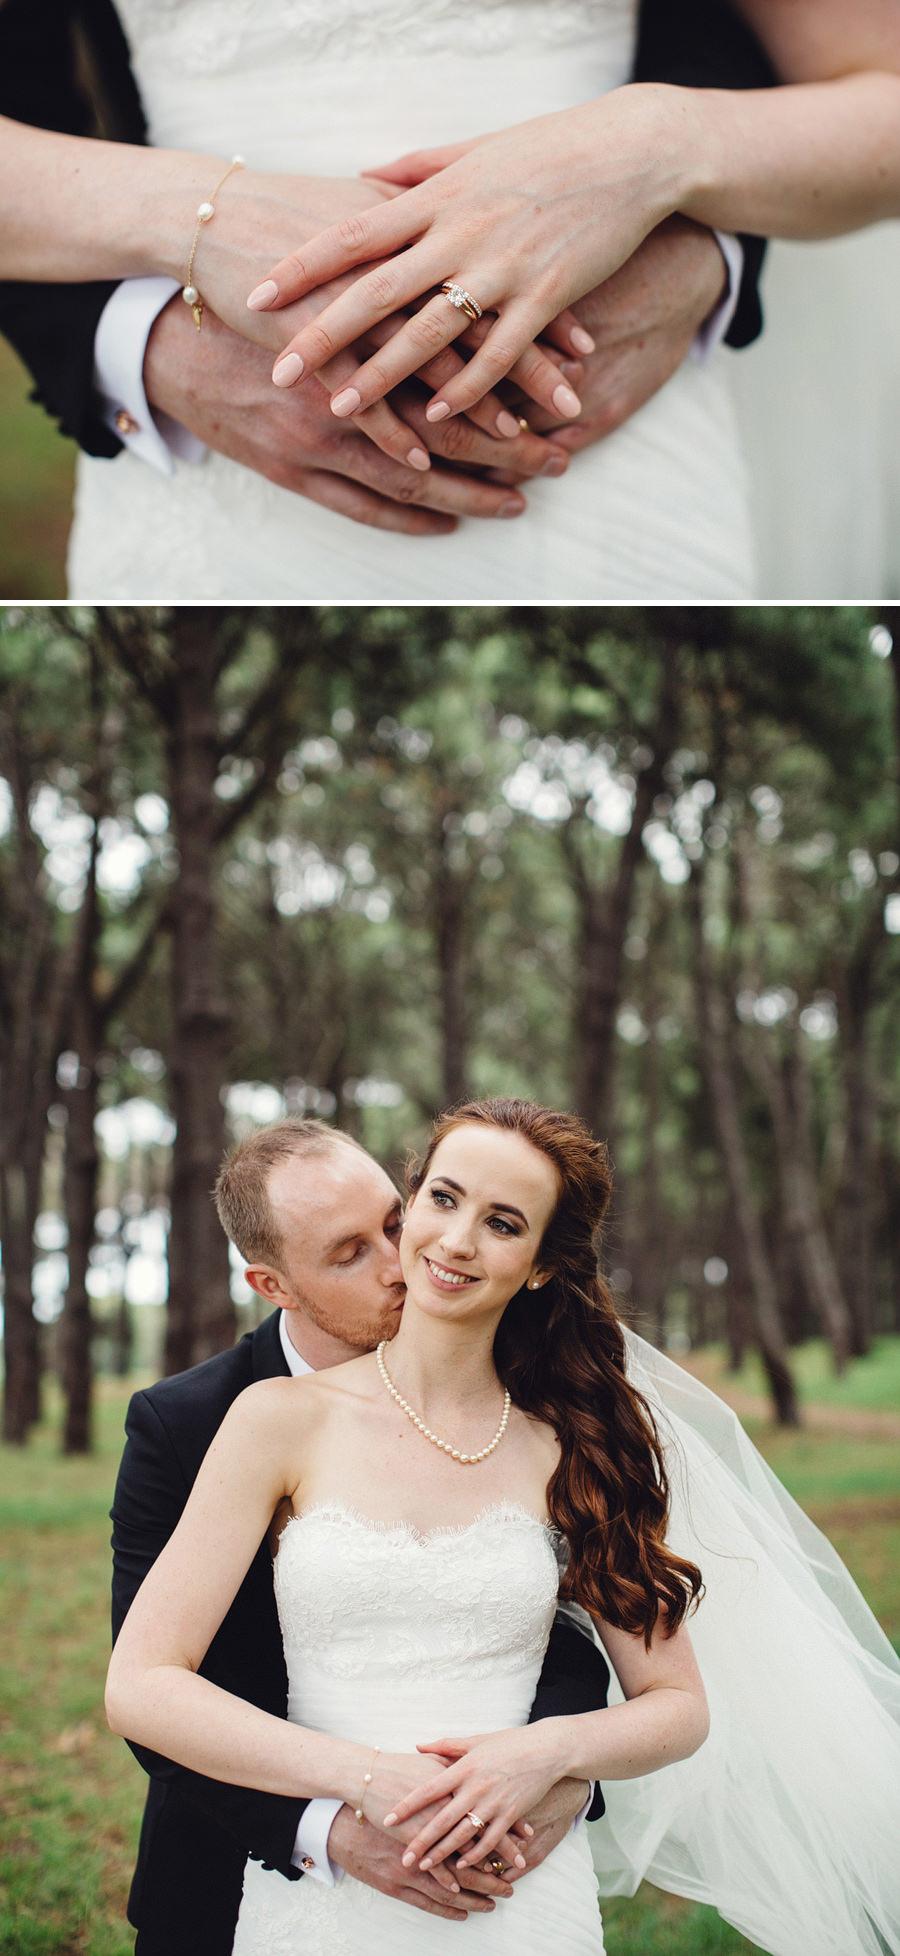 Classic Wedding Photographer: Bridal Party Portraits